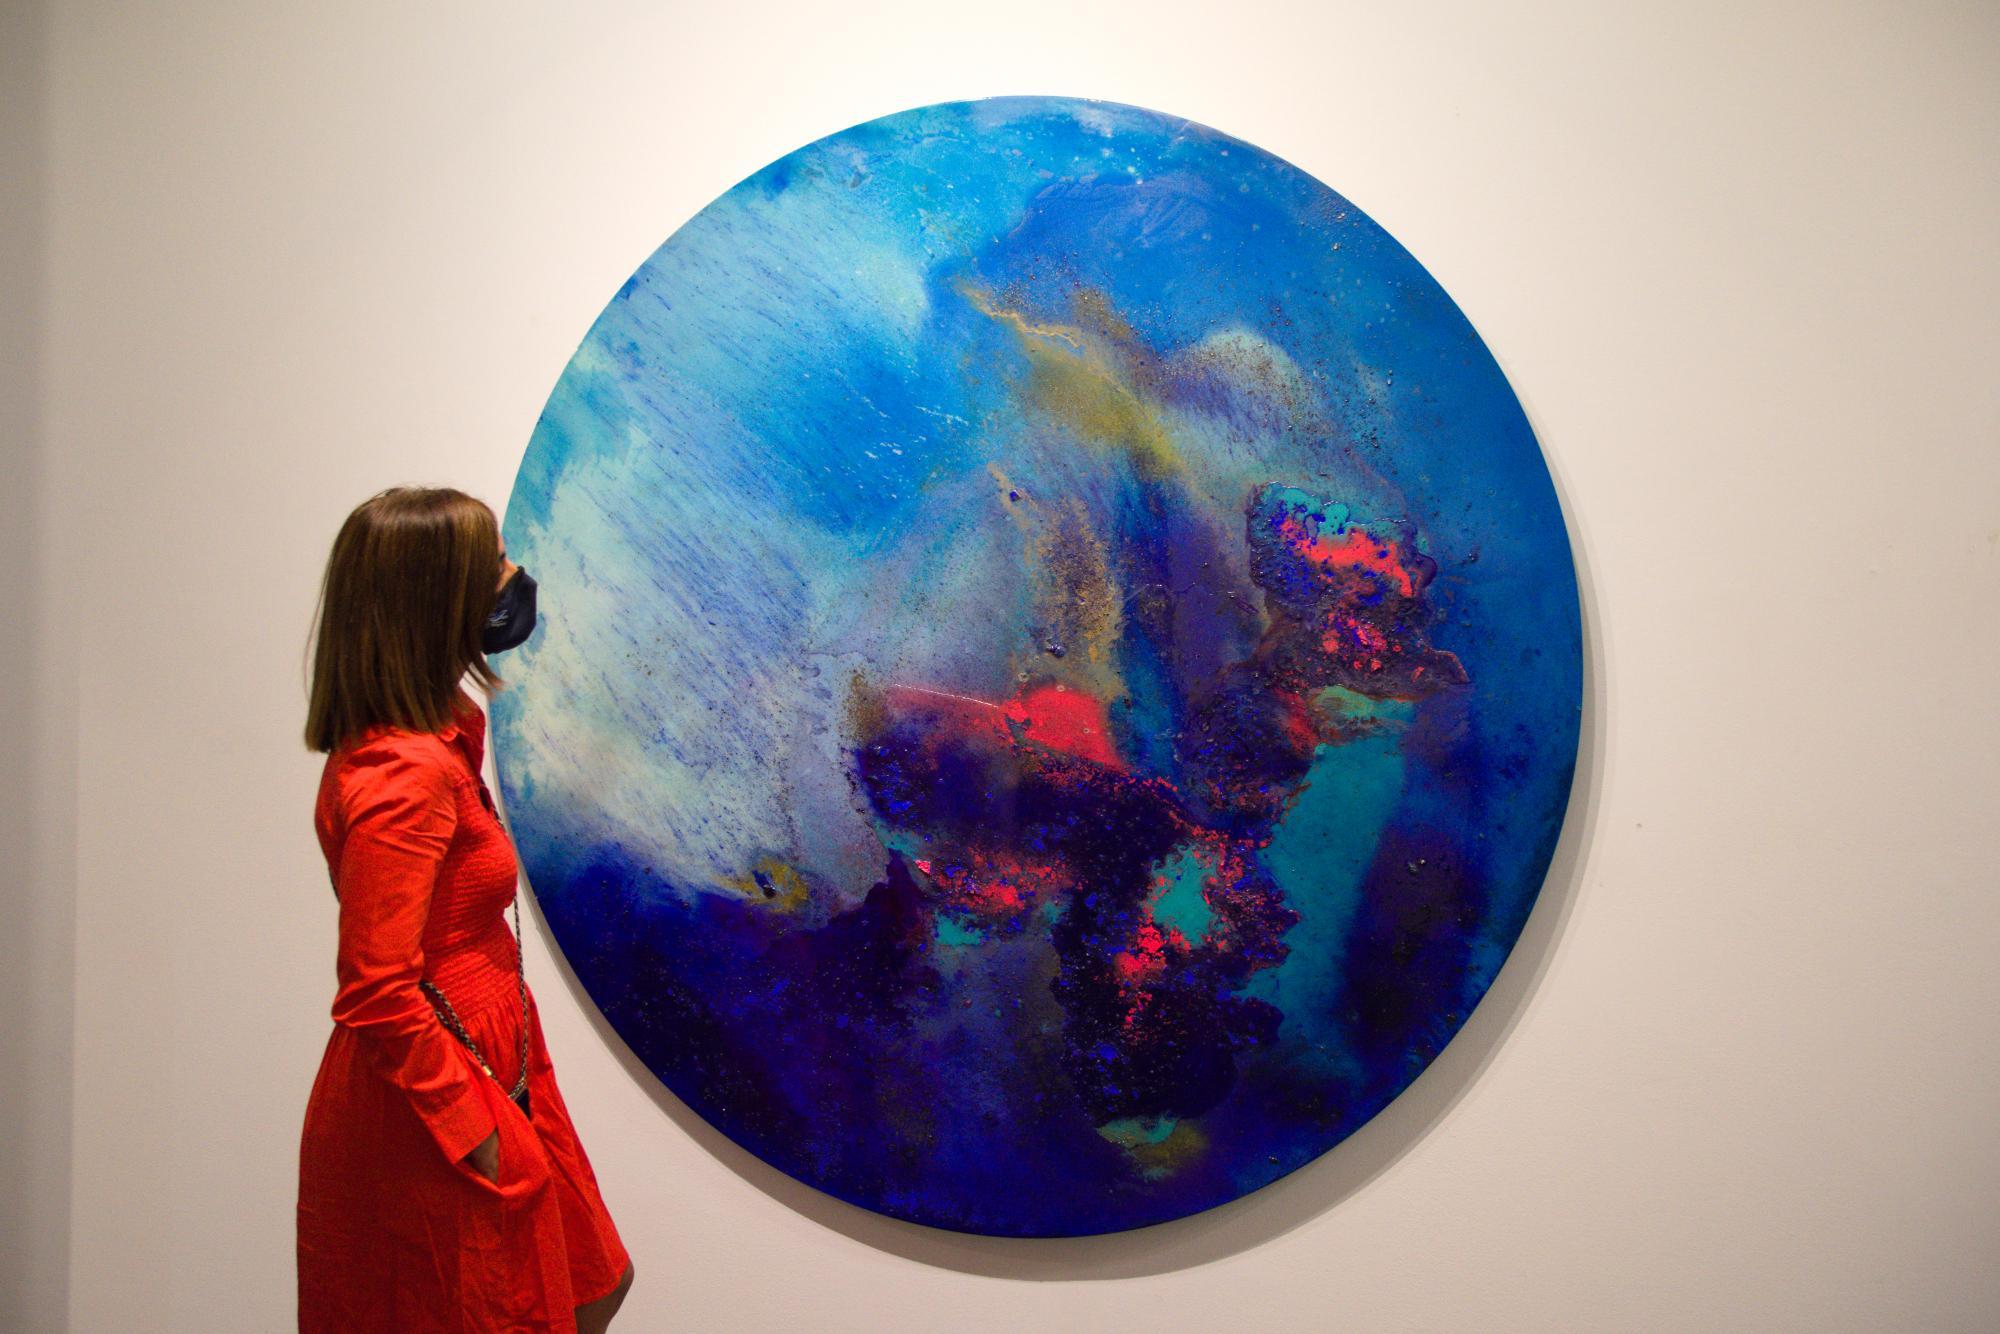 Blue Hope (2020) - Marina Gadea Mateos